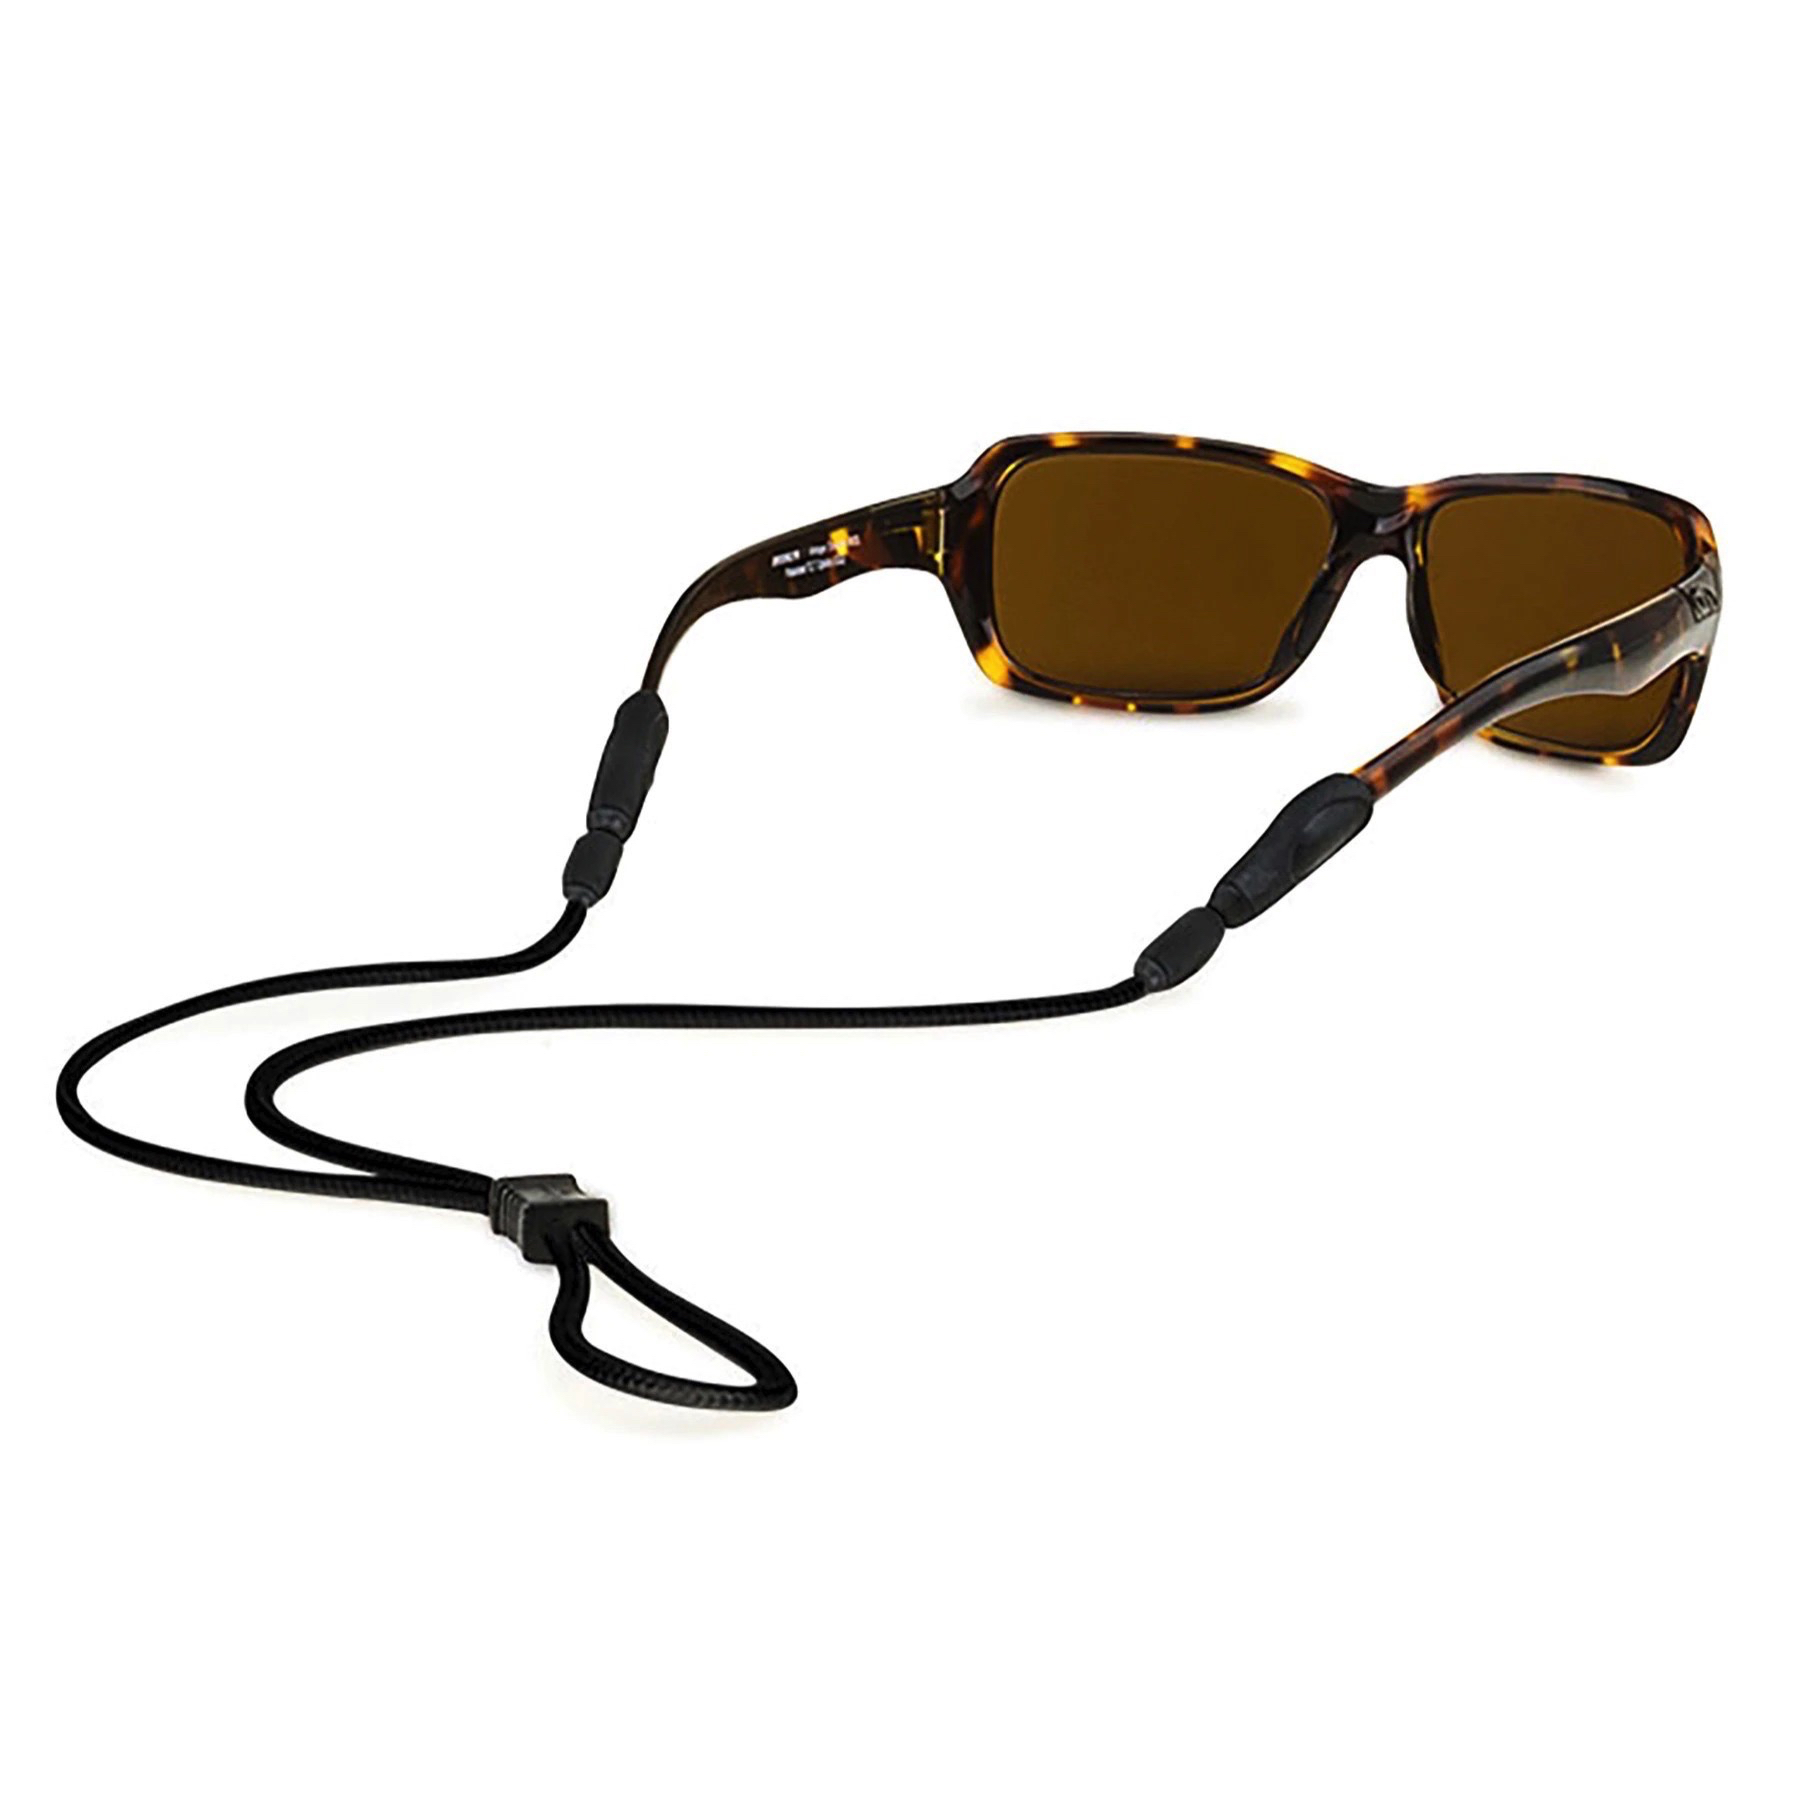 Croakies Original Sub Squatchmo XL Adjustable Re-Attachable Eyewear Retainer